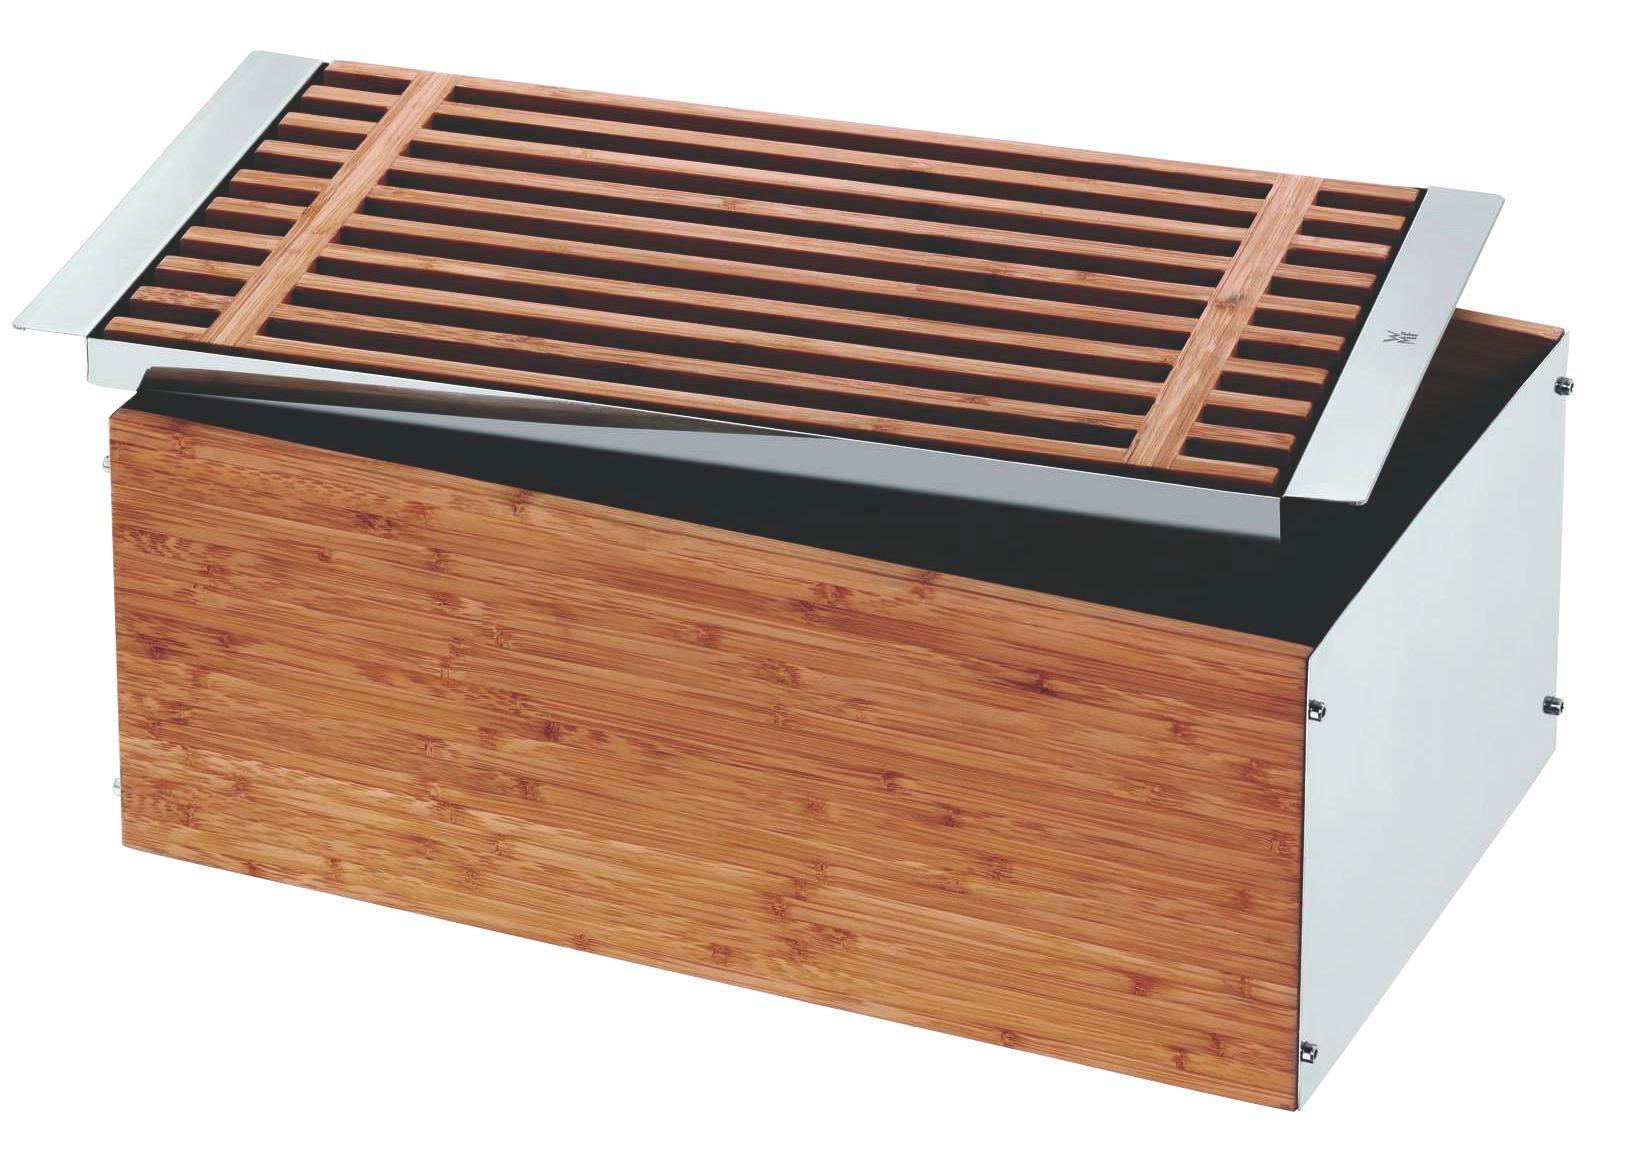 BROTKASTEN - Braun, Basics, Holz/Metall (46/26/18cm) - WMF